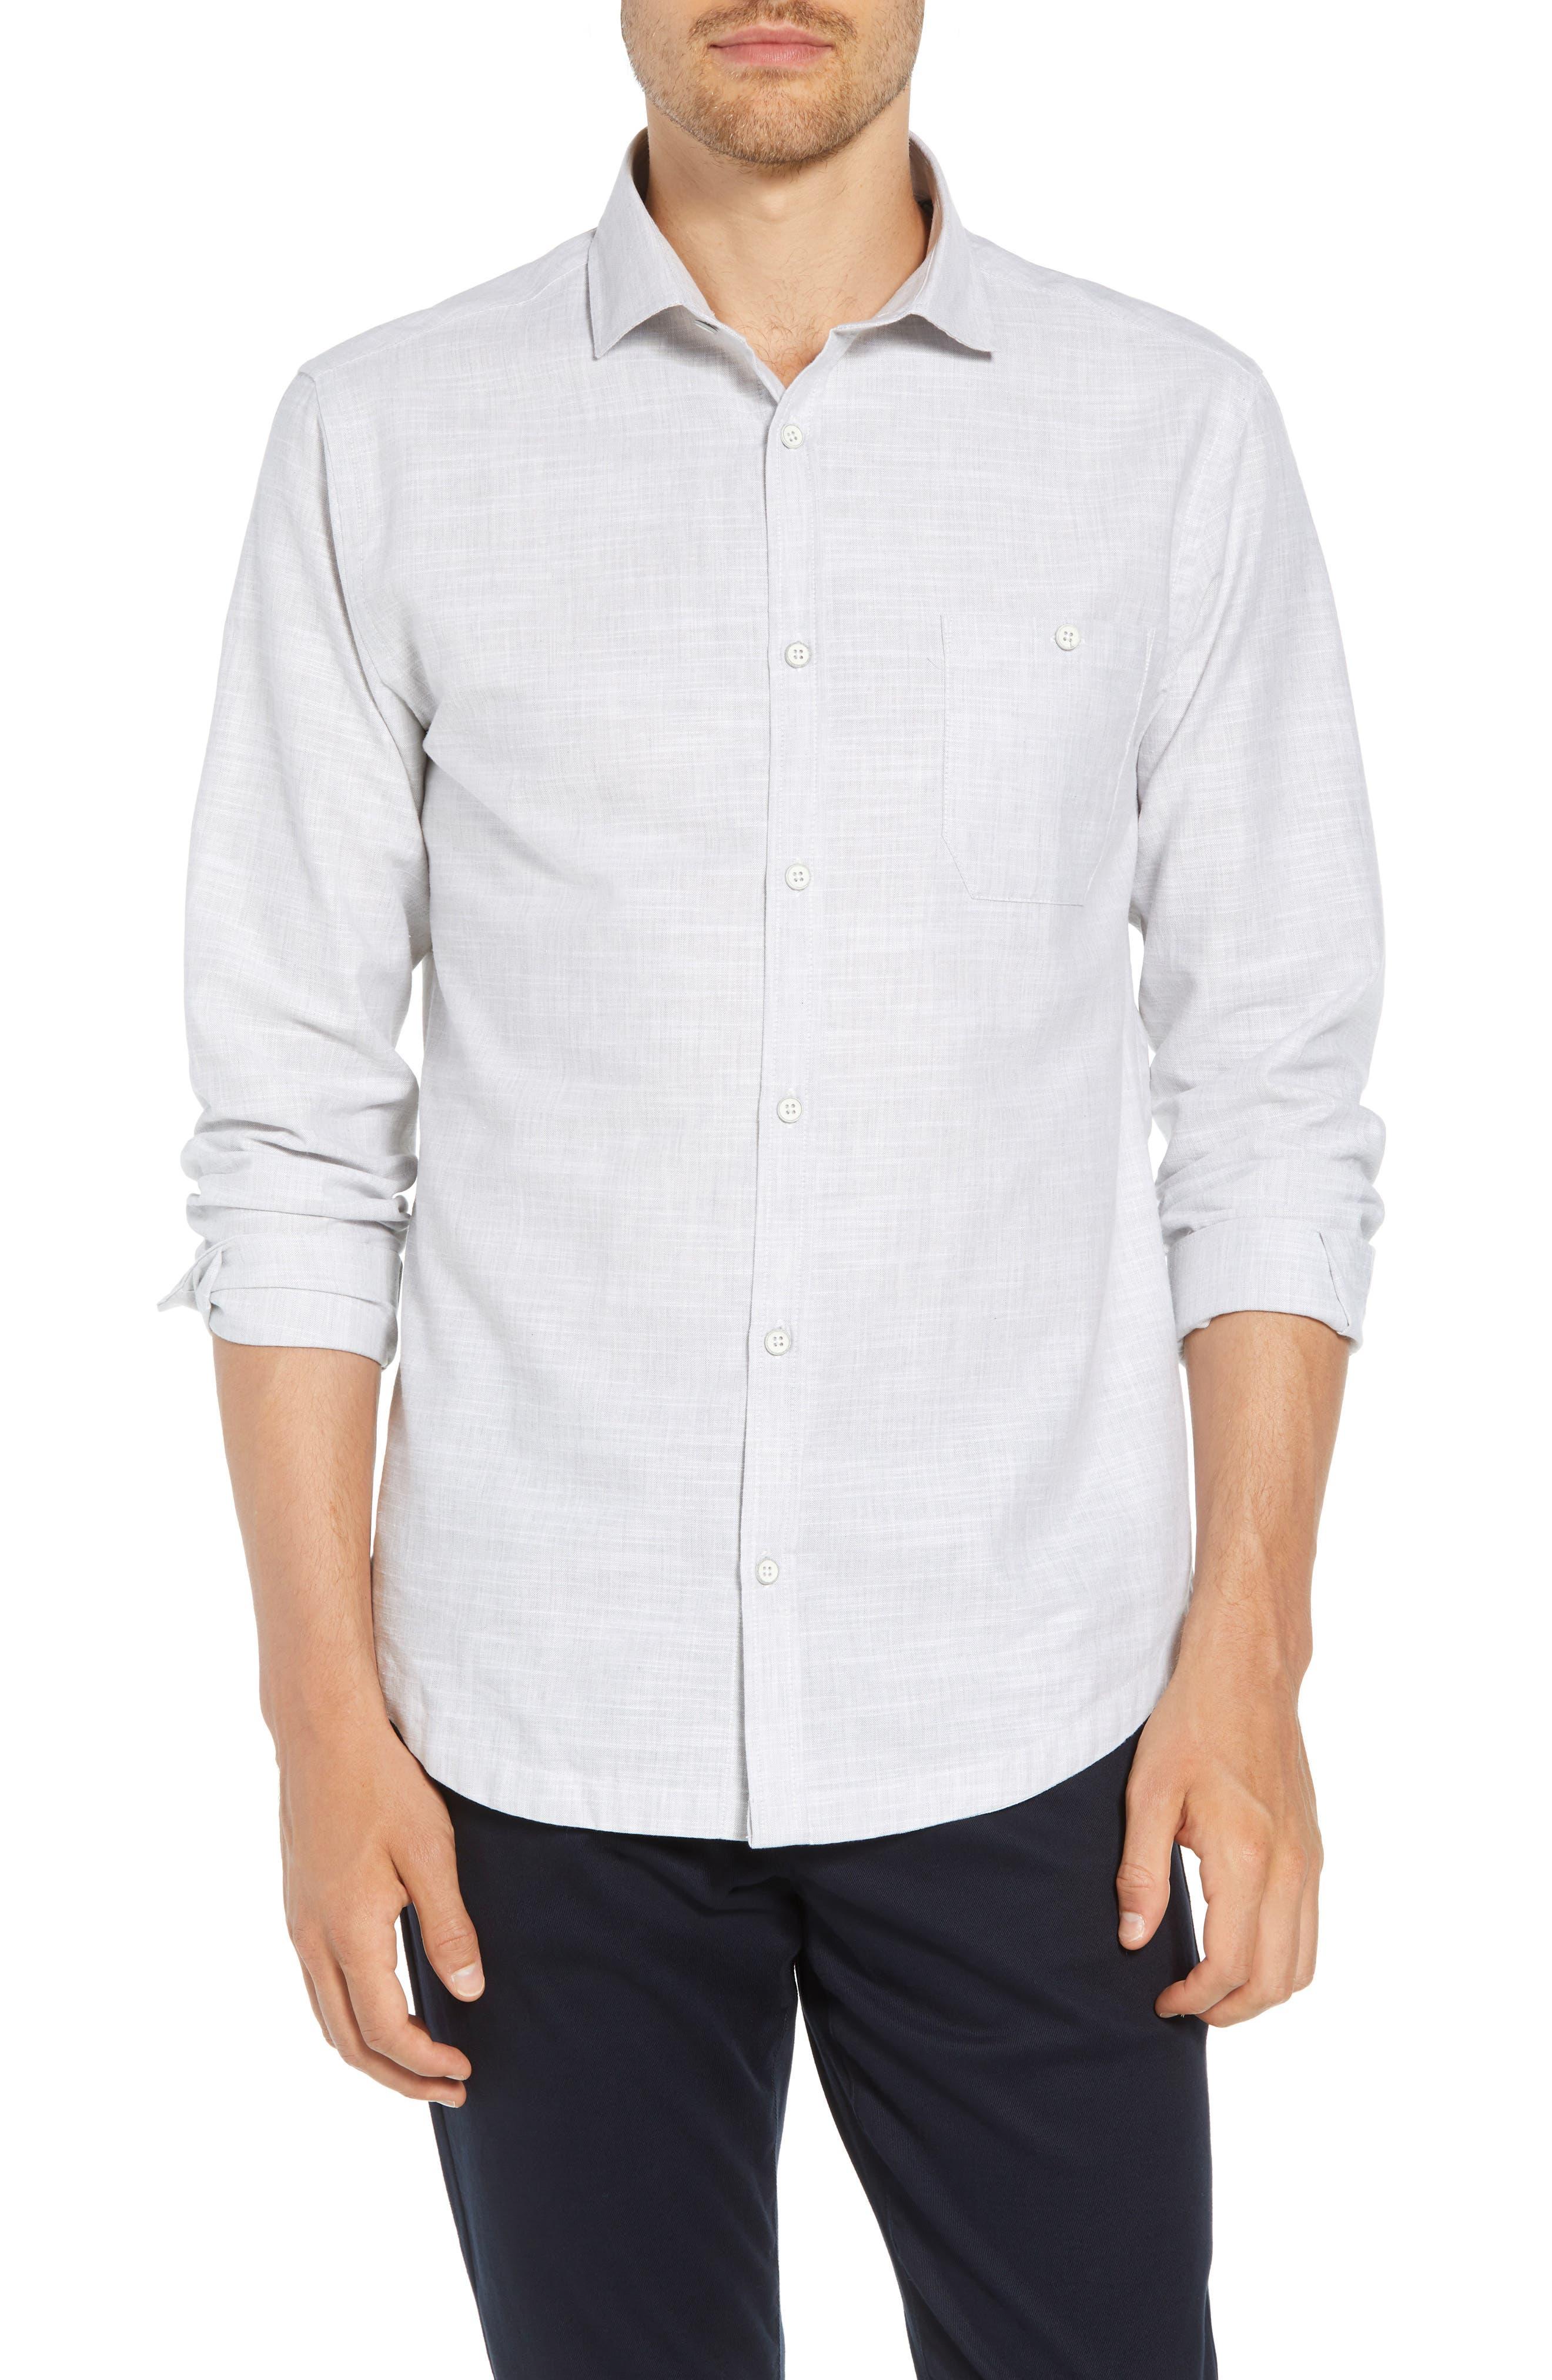 Rugger Regular Fit Sport Shirt,                         Main,                         color, LIGHT GREY